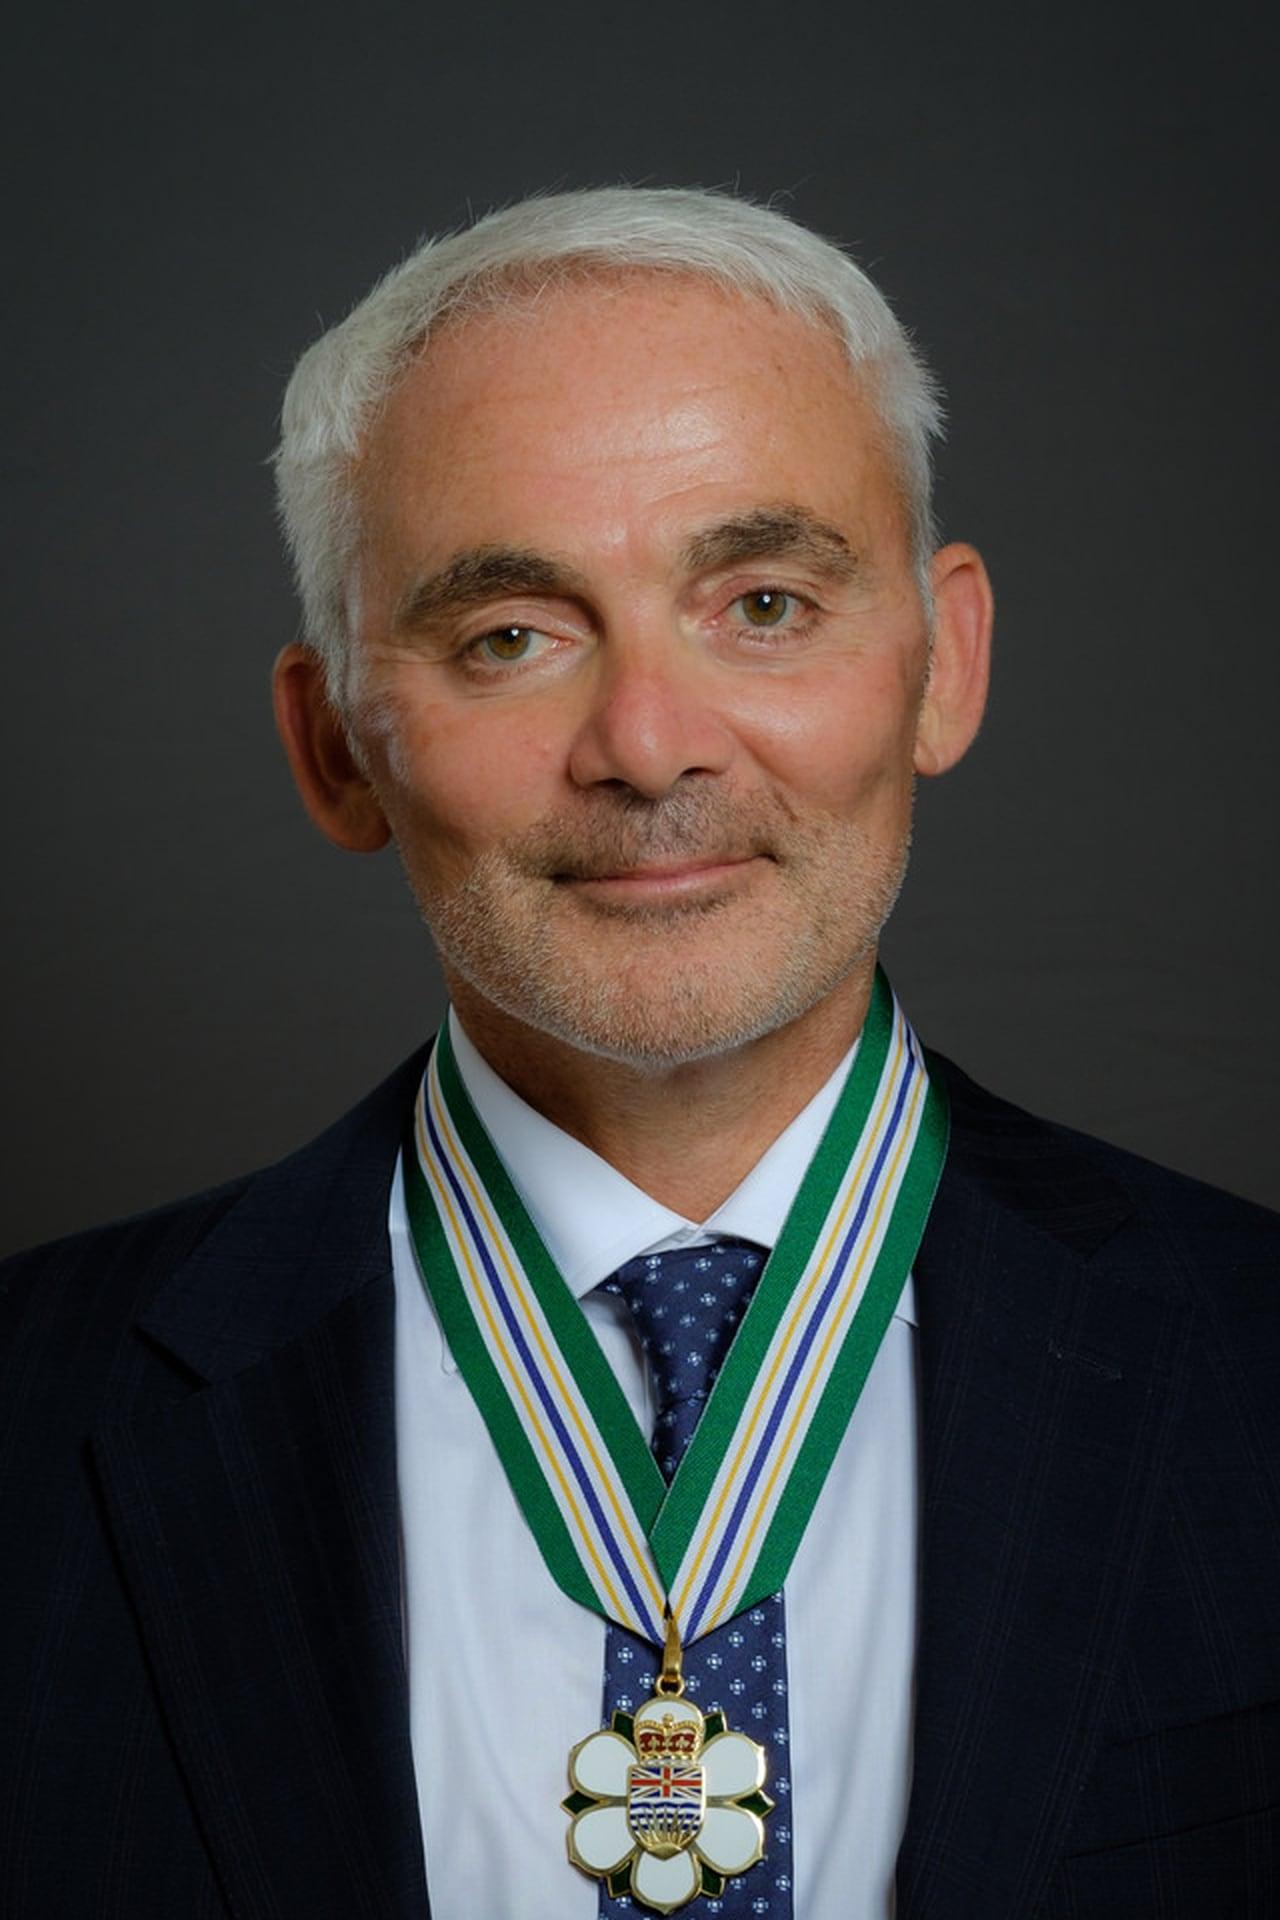 Frank Giustra